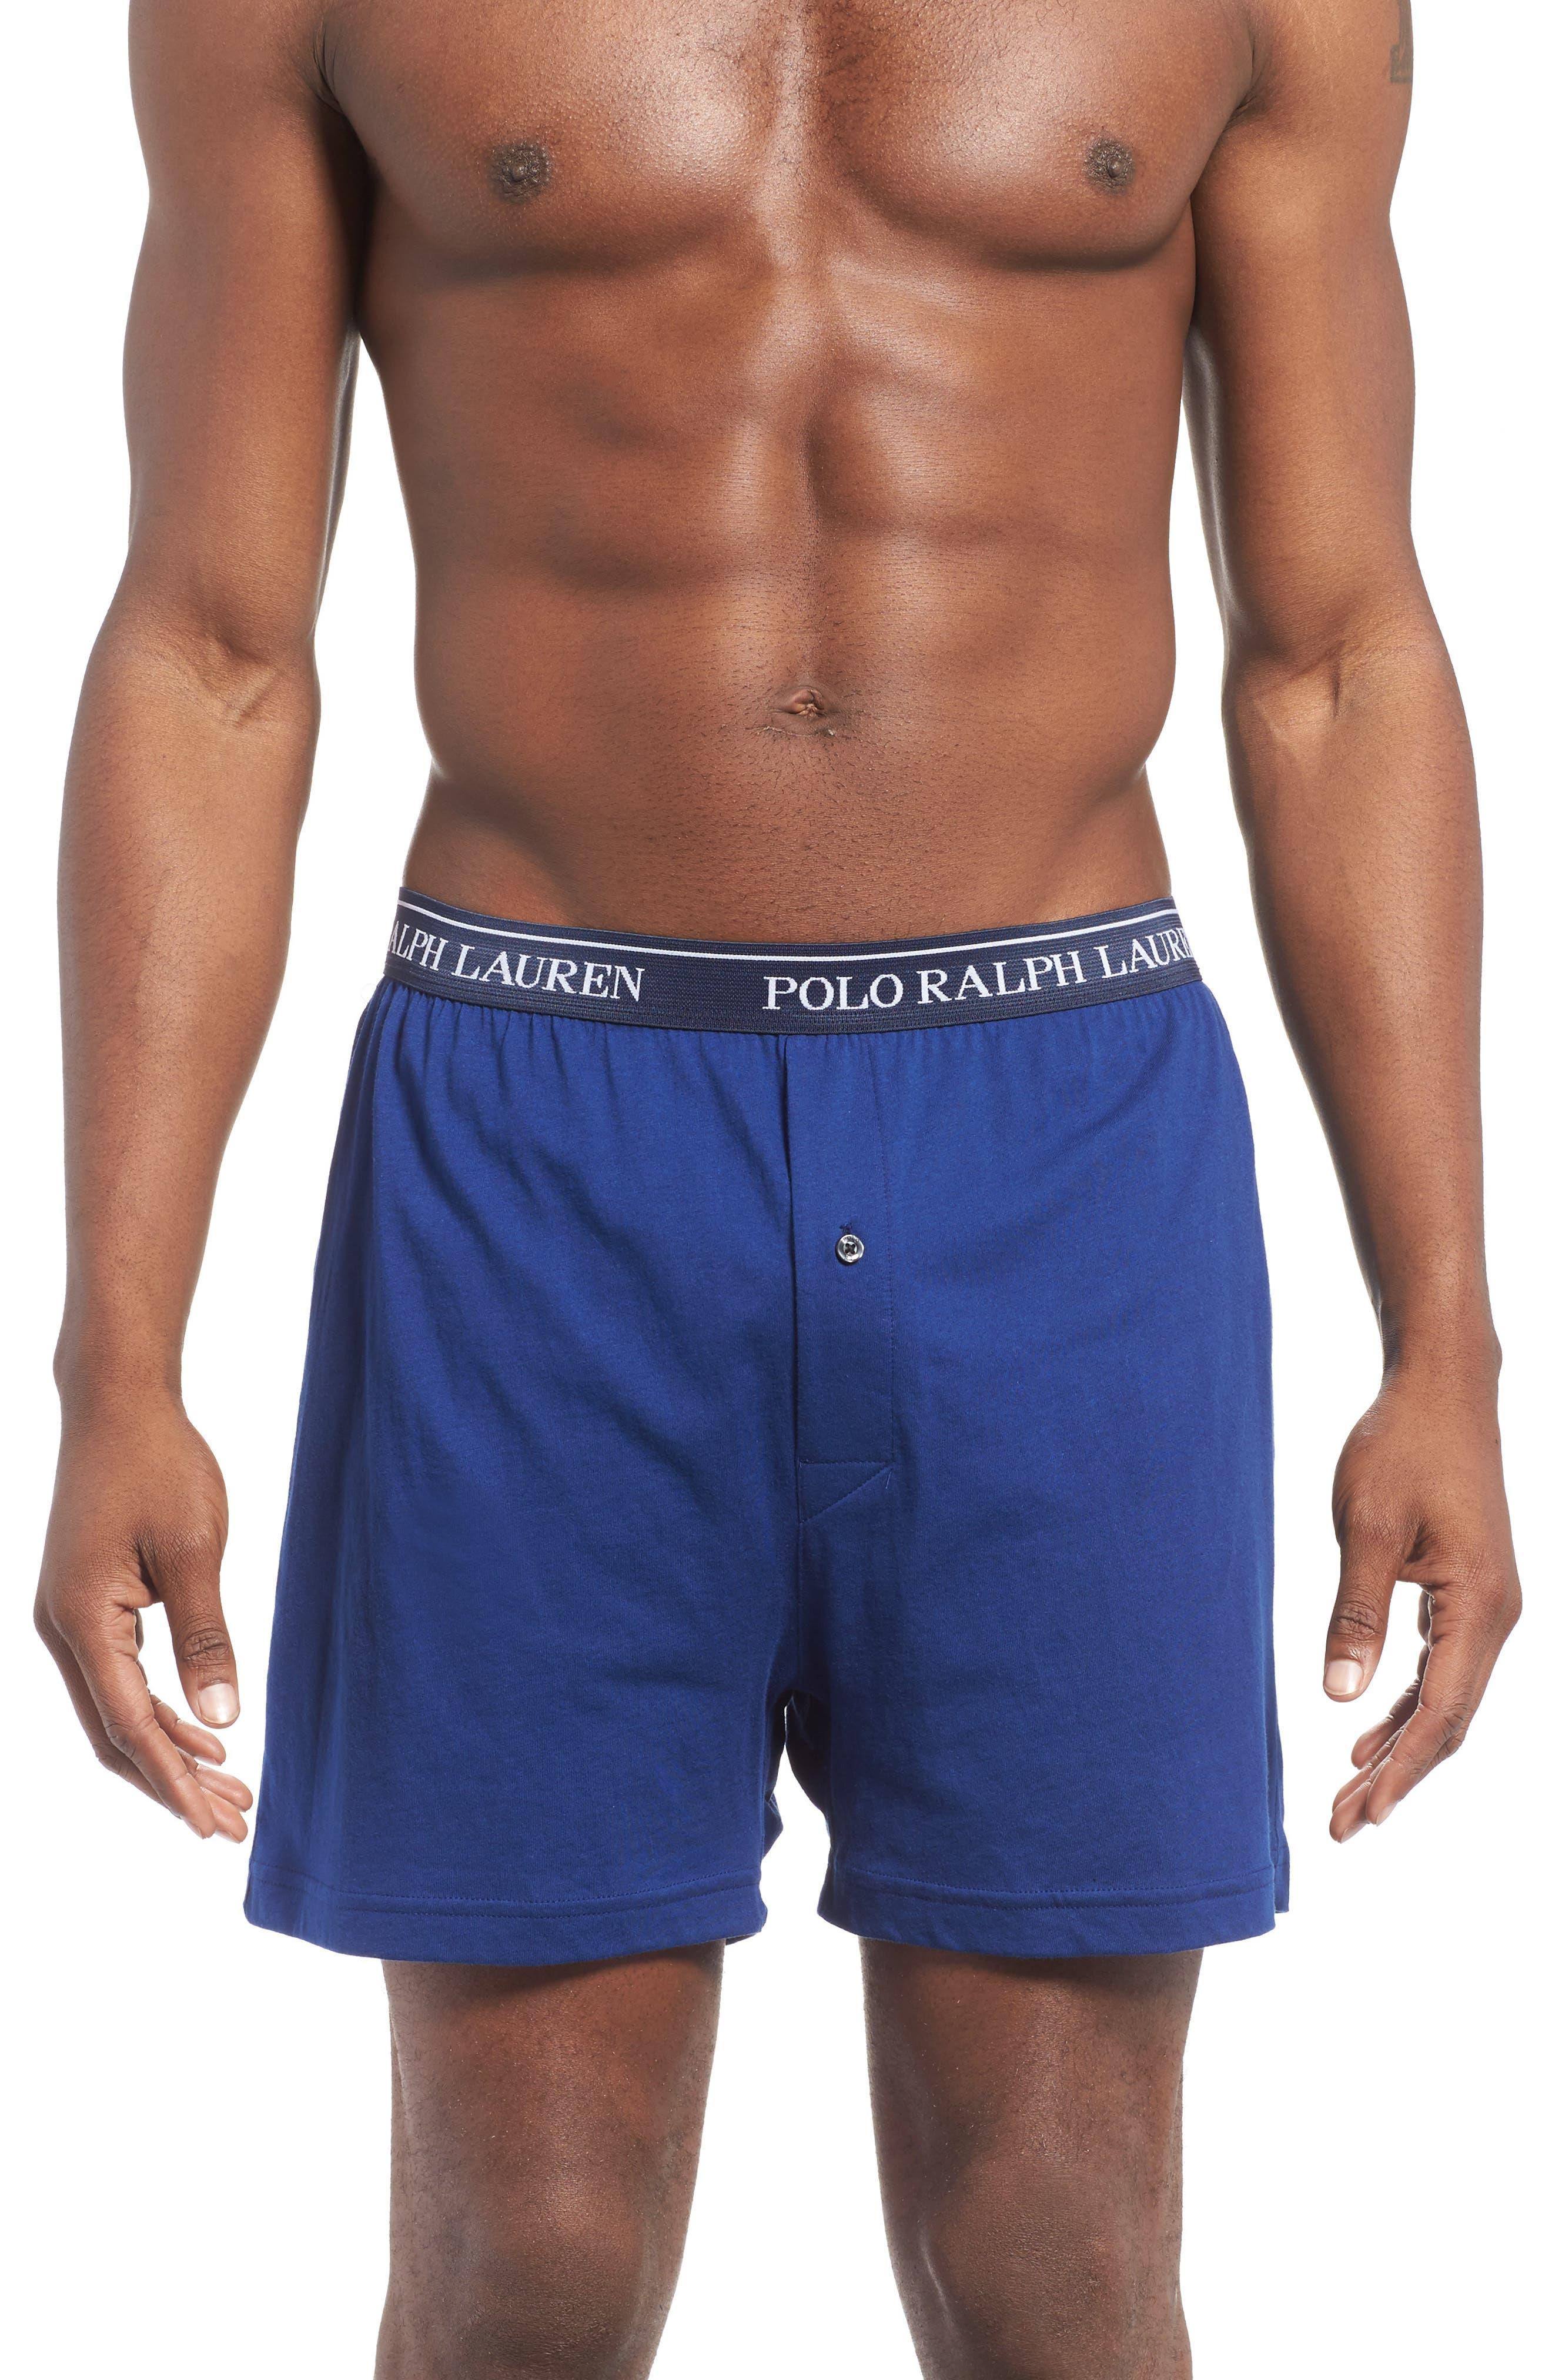 5-Pack Cotton Boxers,                             Alternate thumbnail 2, color,                             BLUE/ ROYAL BLUE/ NAVY